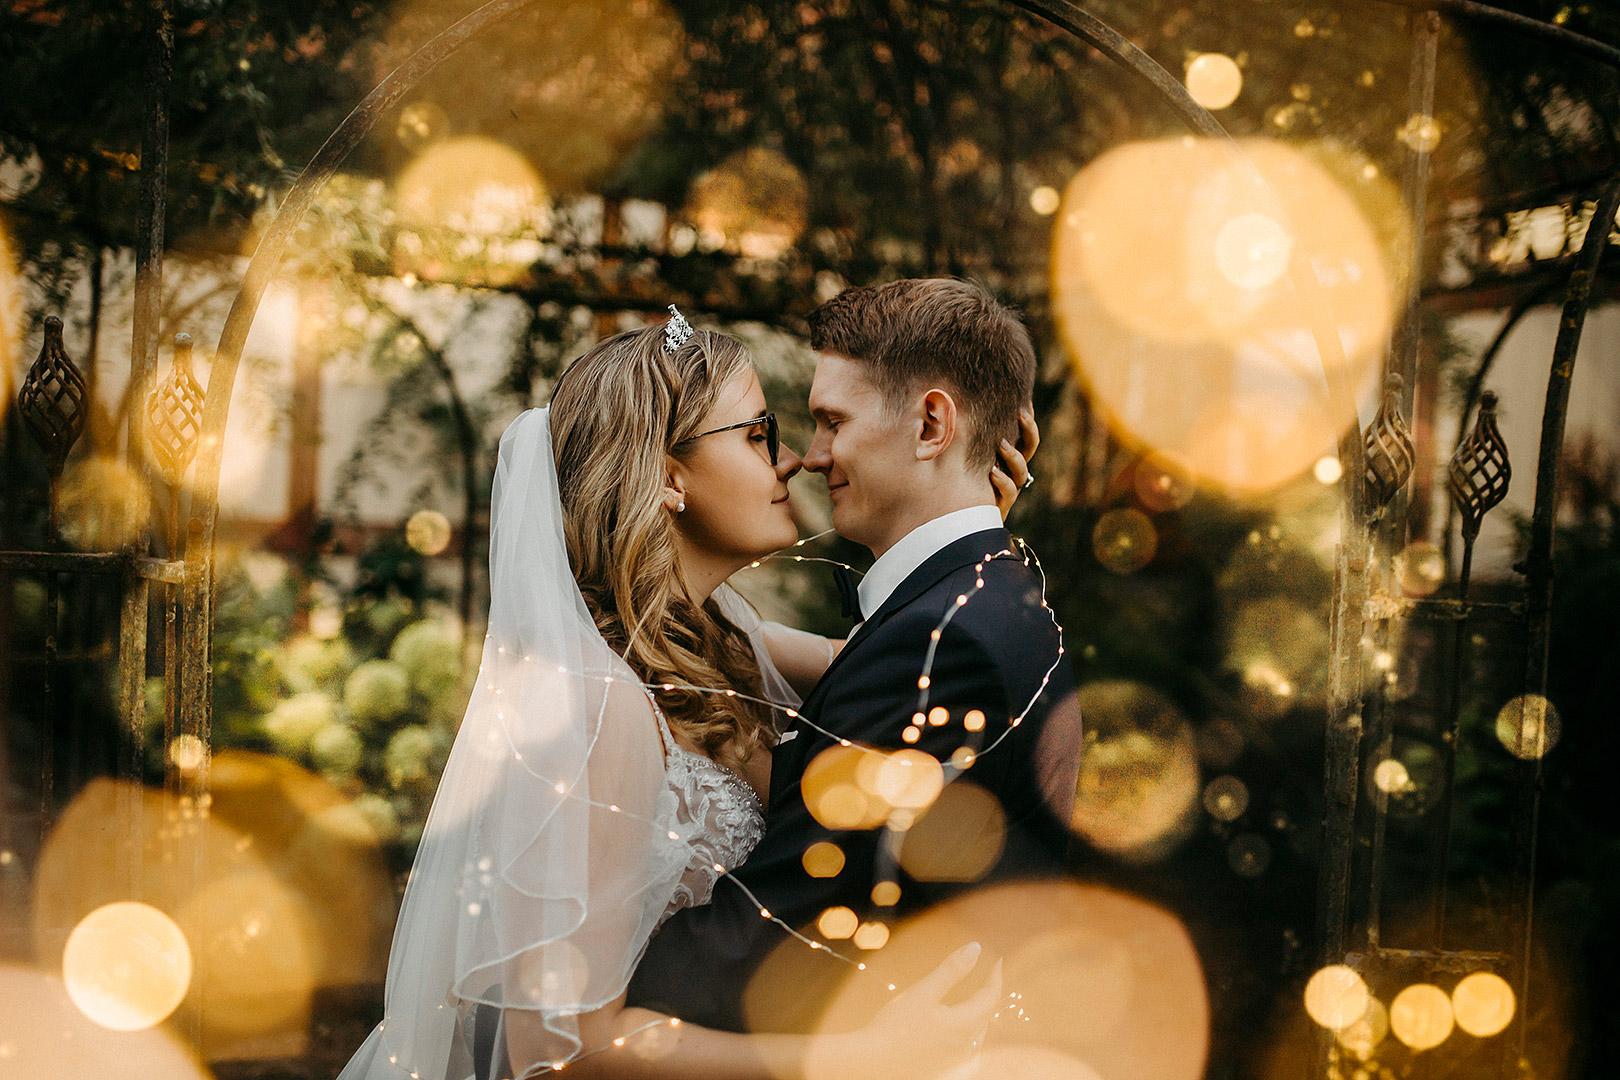 portrait_wedding_saskiaunddavid_79